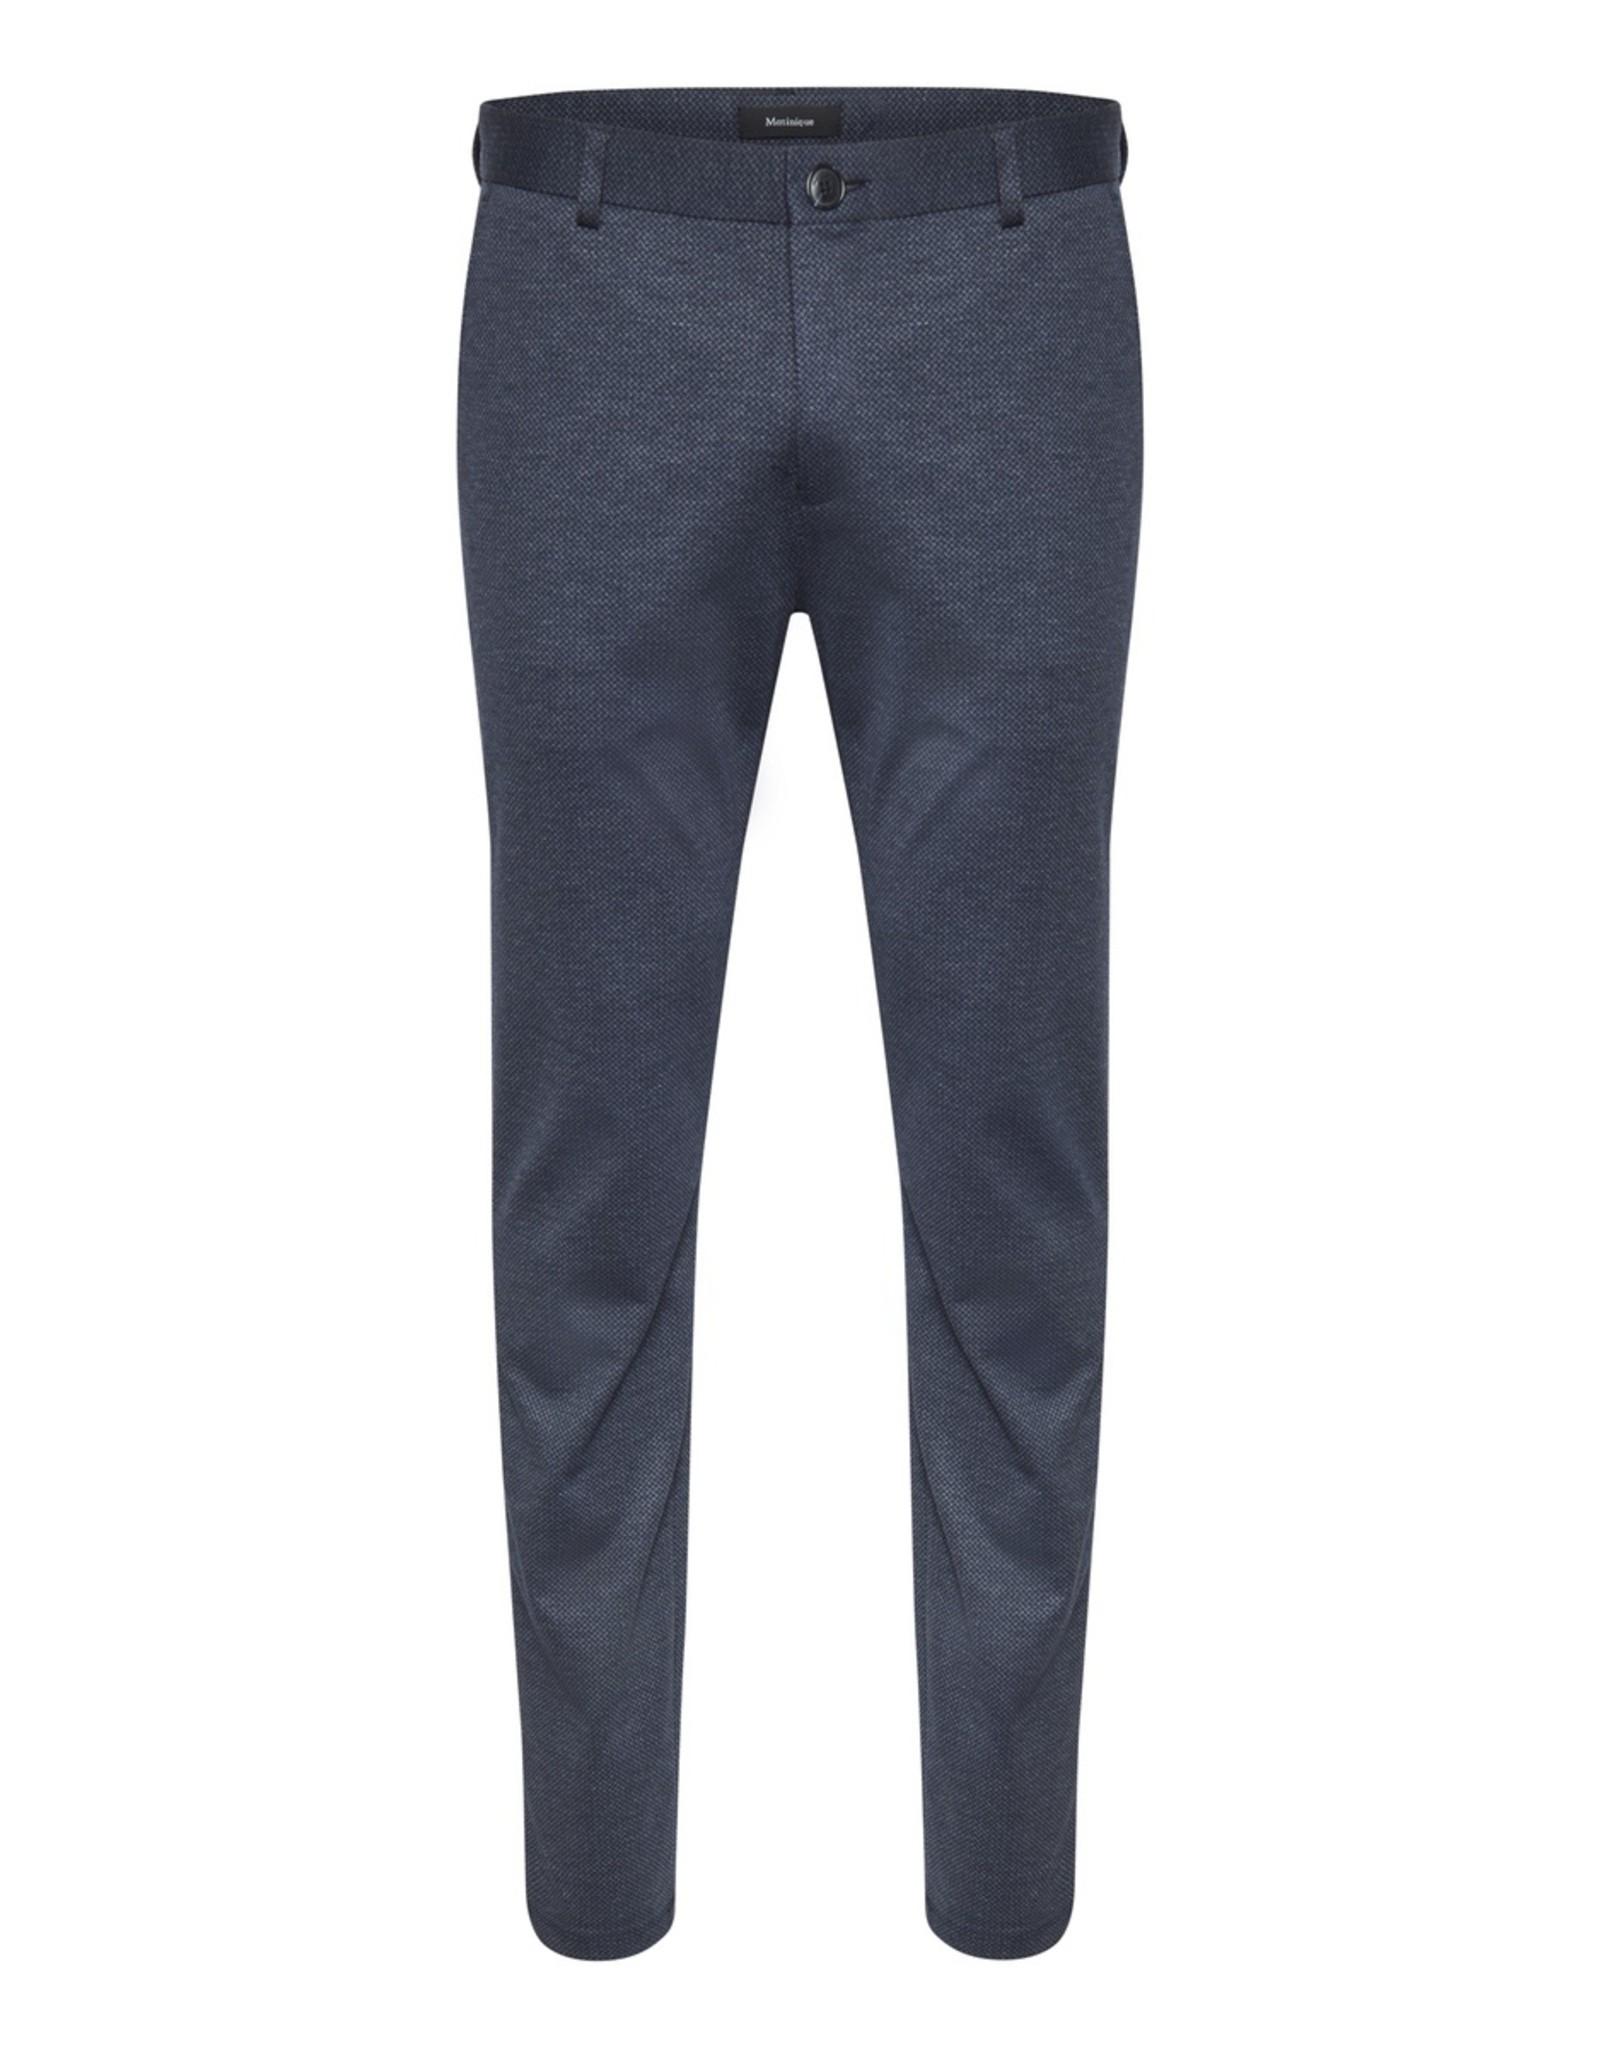 Matinique Patton Weave Jersey Pant